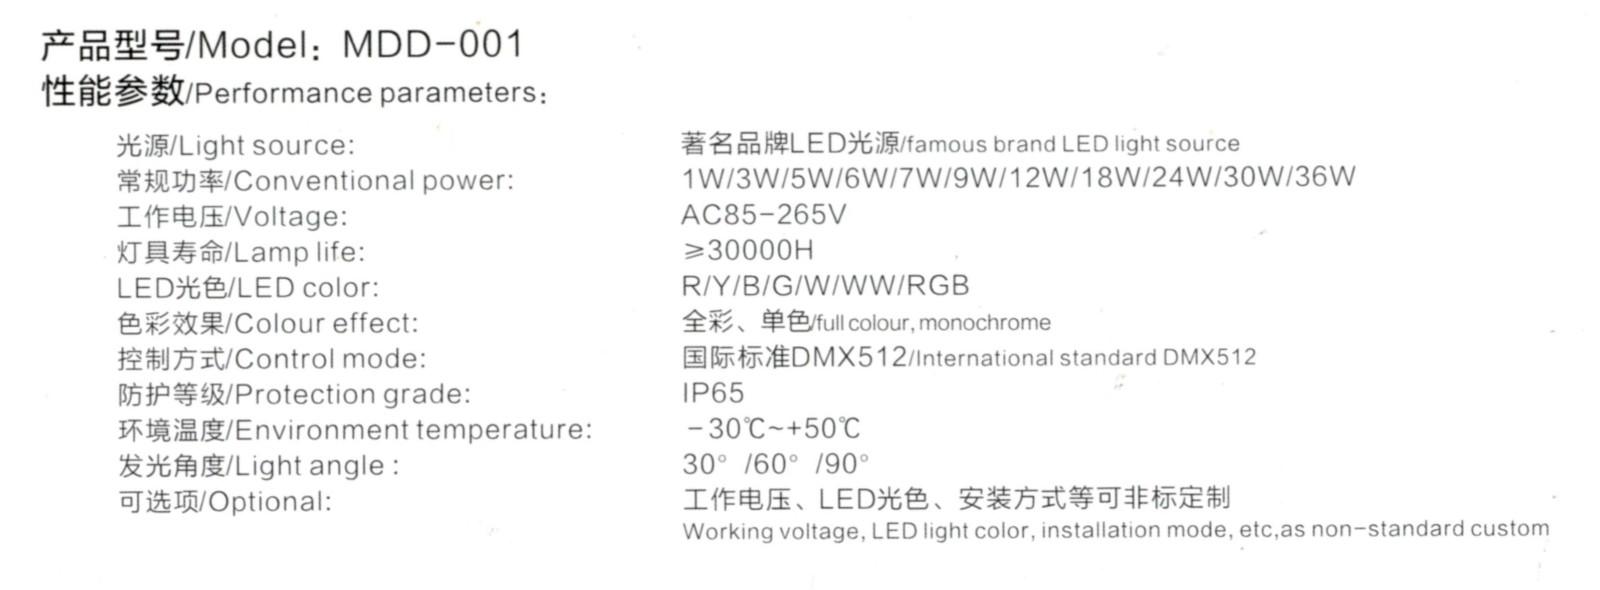 LED埋地灯Model∶MDD-001参数.jpg